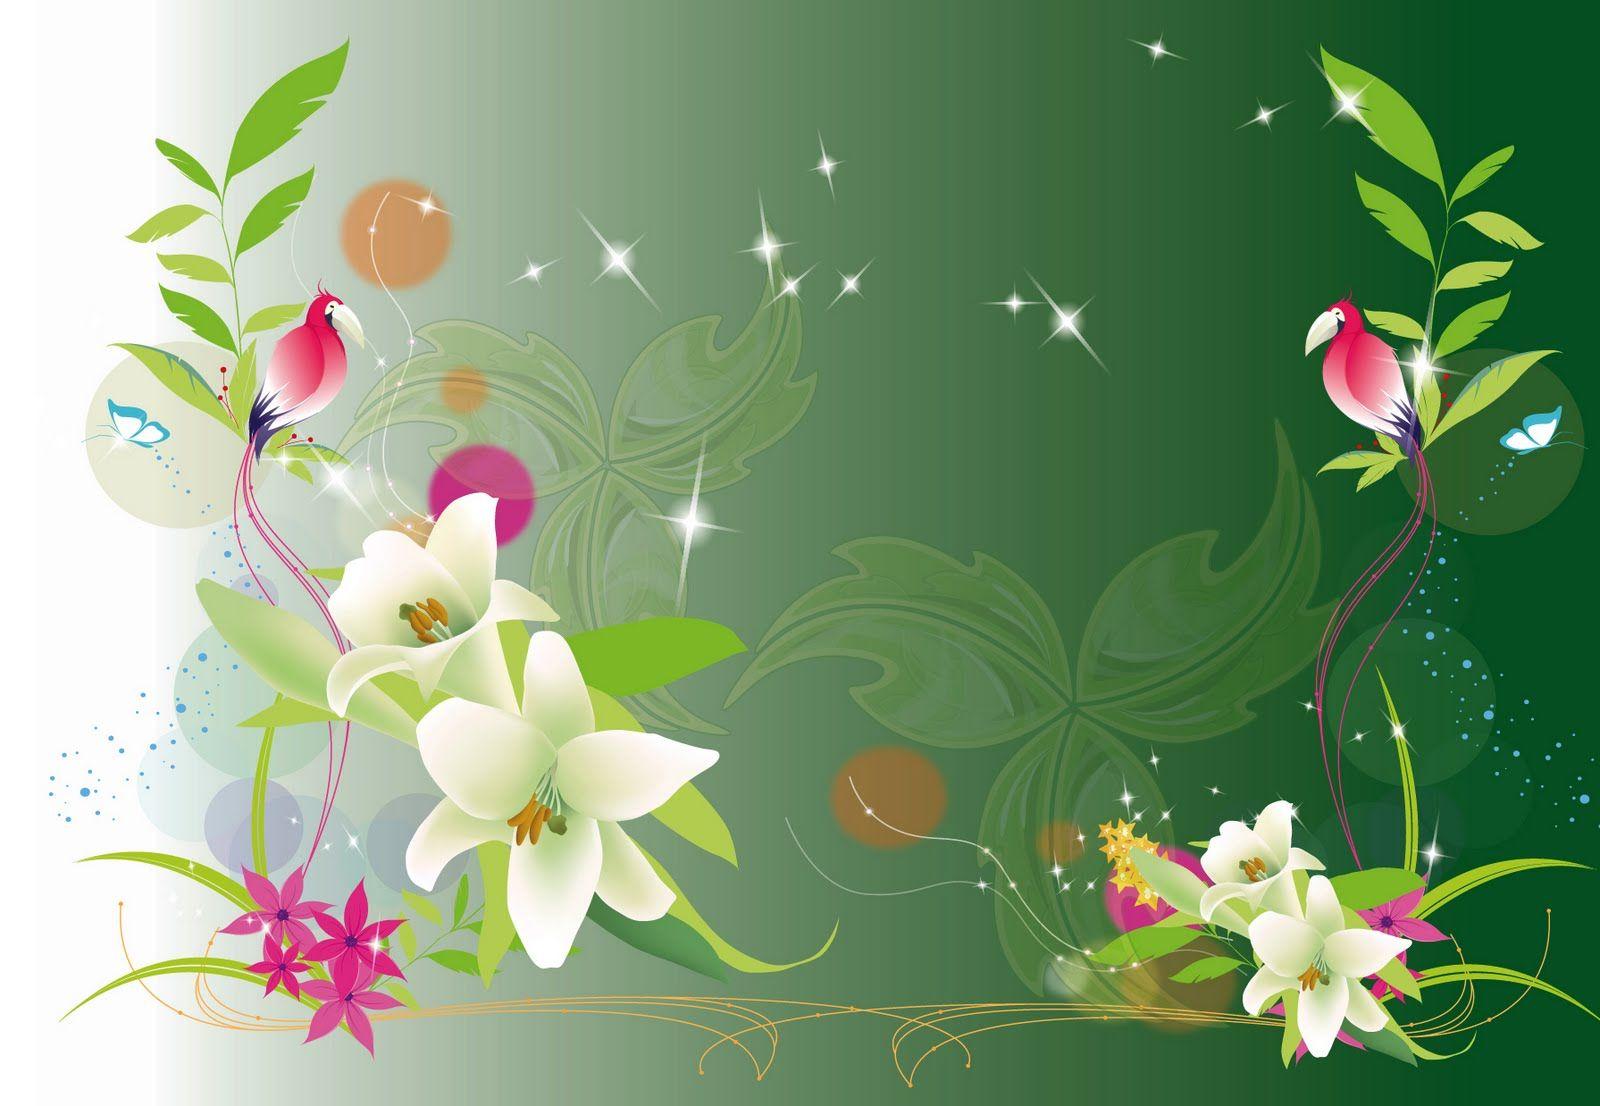 17 Best images about frames on Pinterest | Flower backgrounds ...